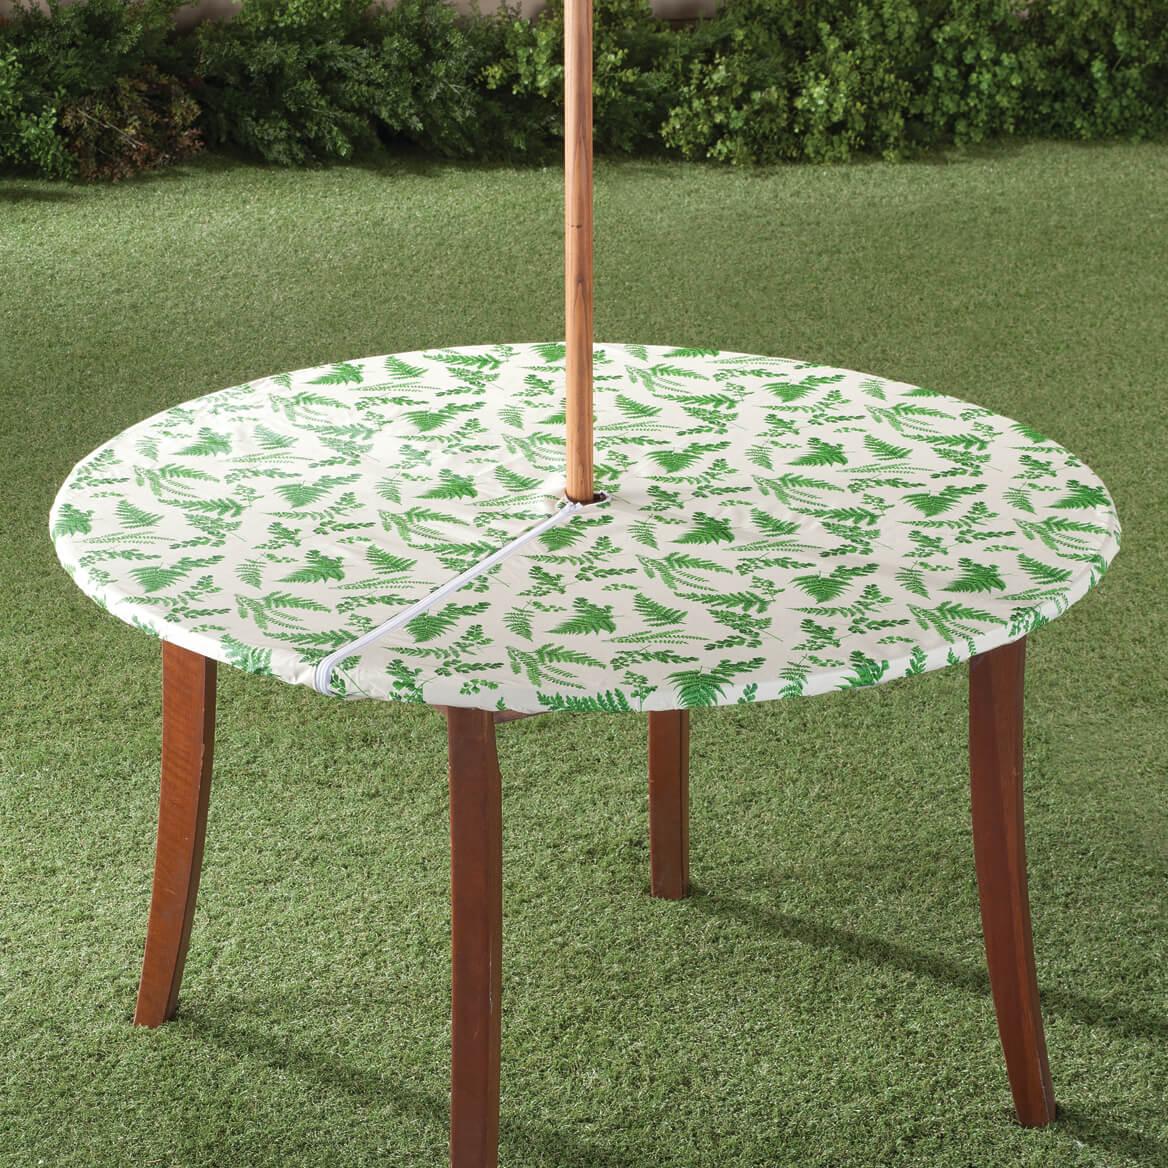 Garden greenery zippered elasticized umbrella table cover 358463